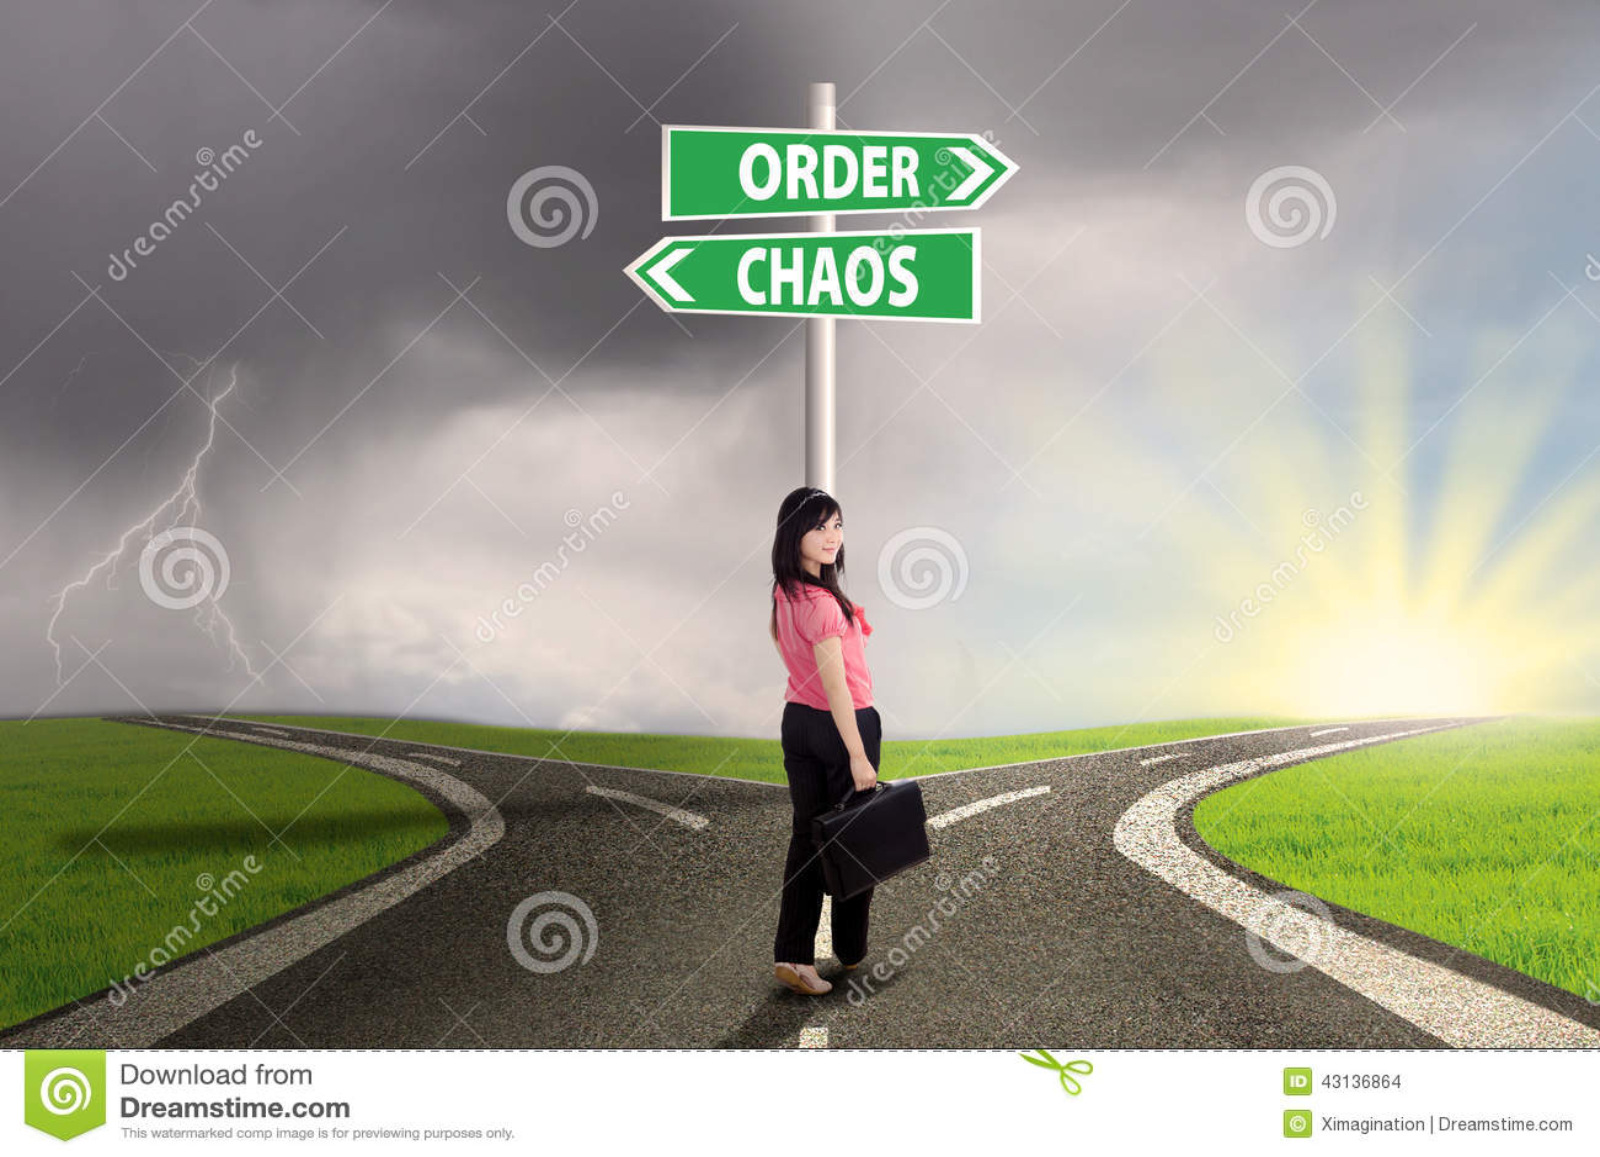 Chaos en ordekeus 2